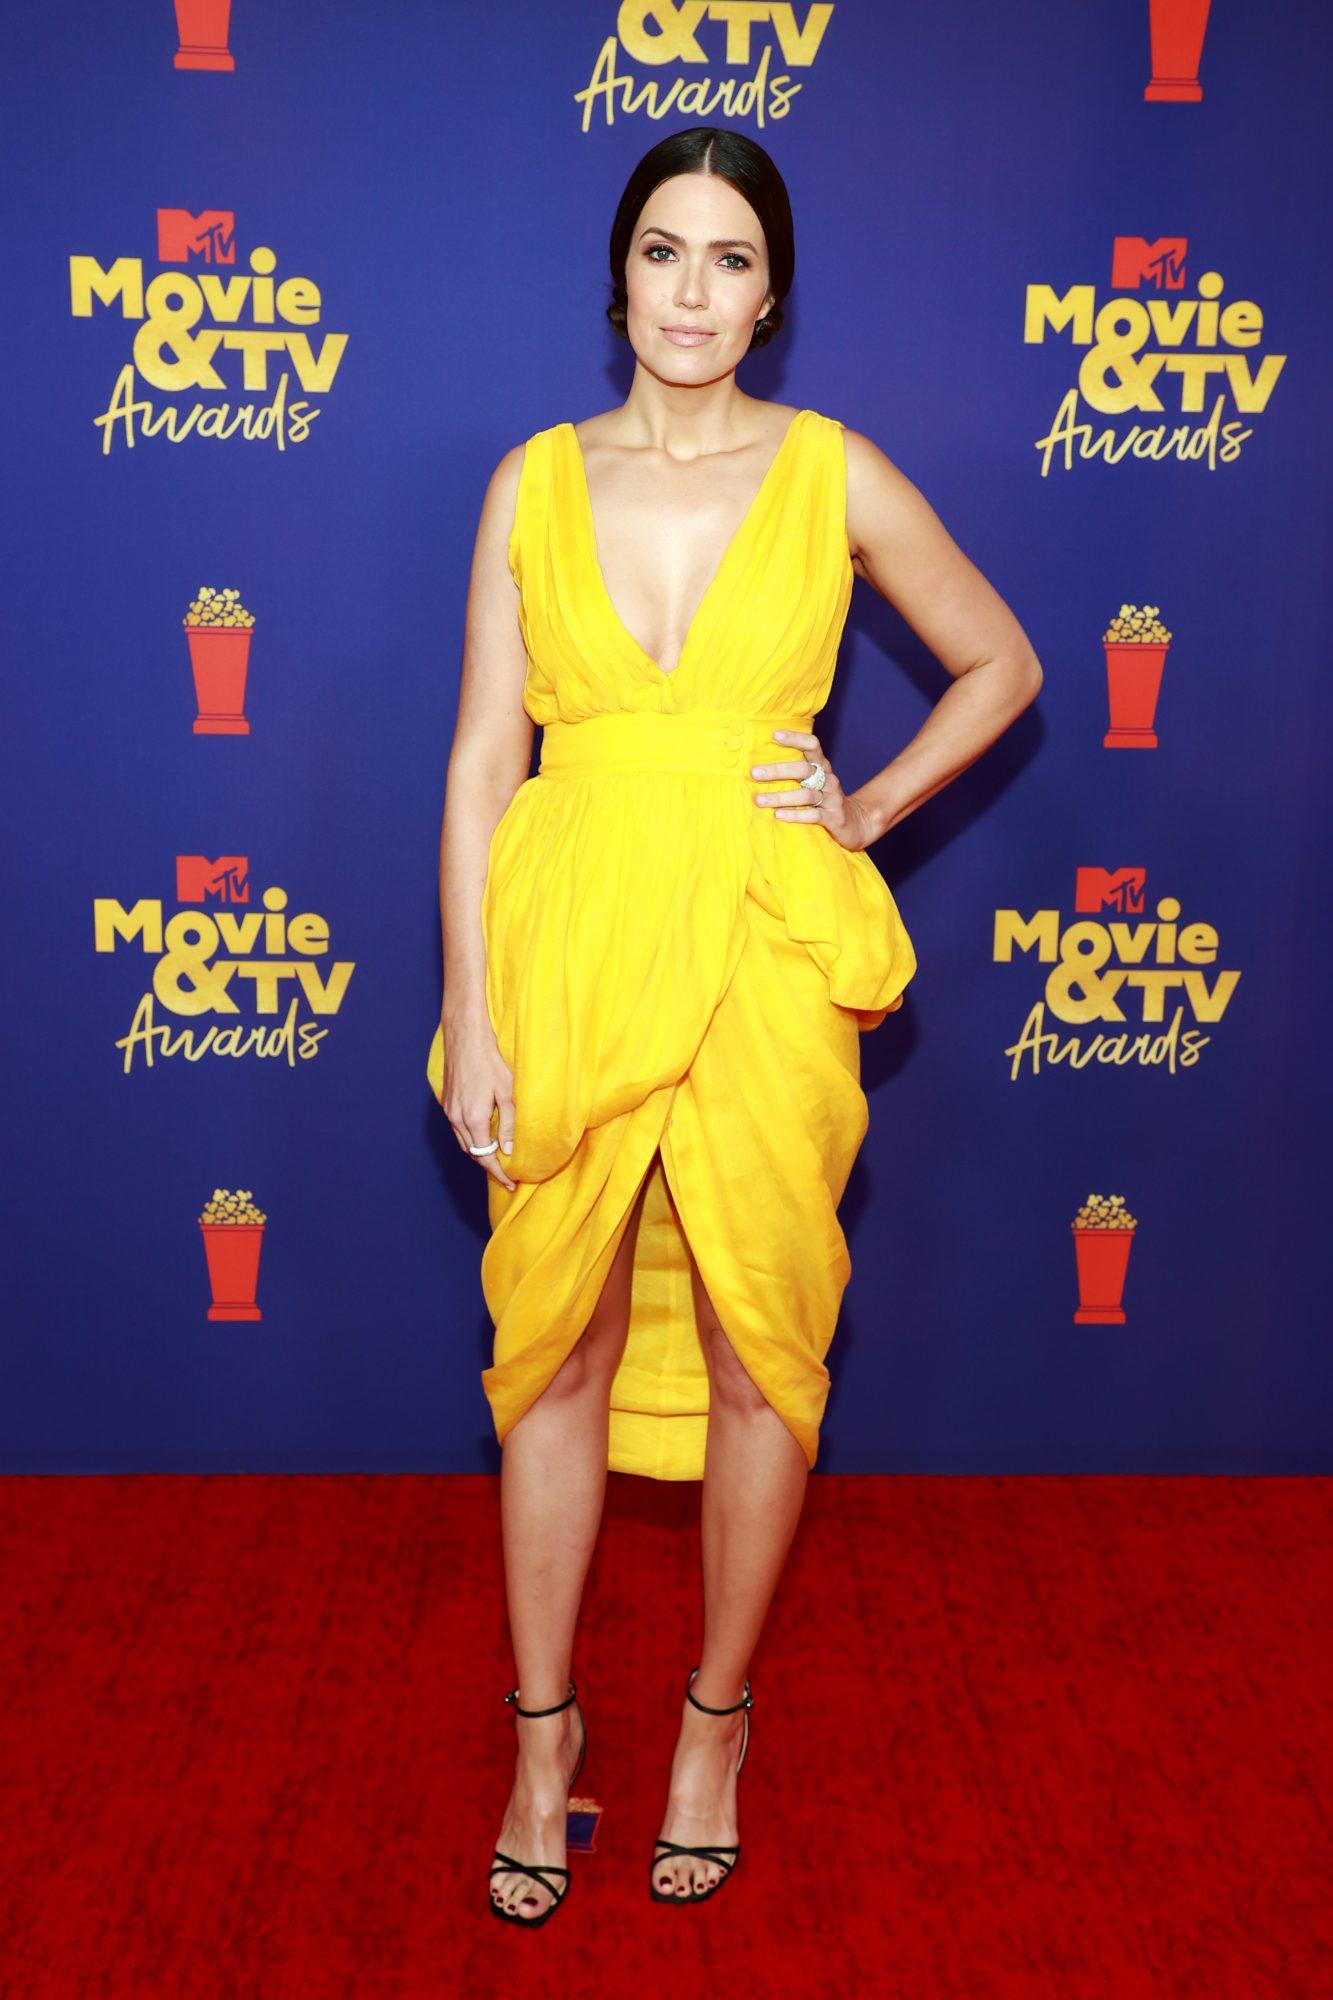 MTV Movie & Television Awards, Mandy Moore